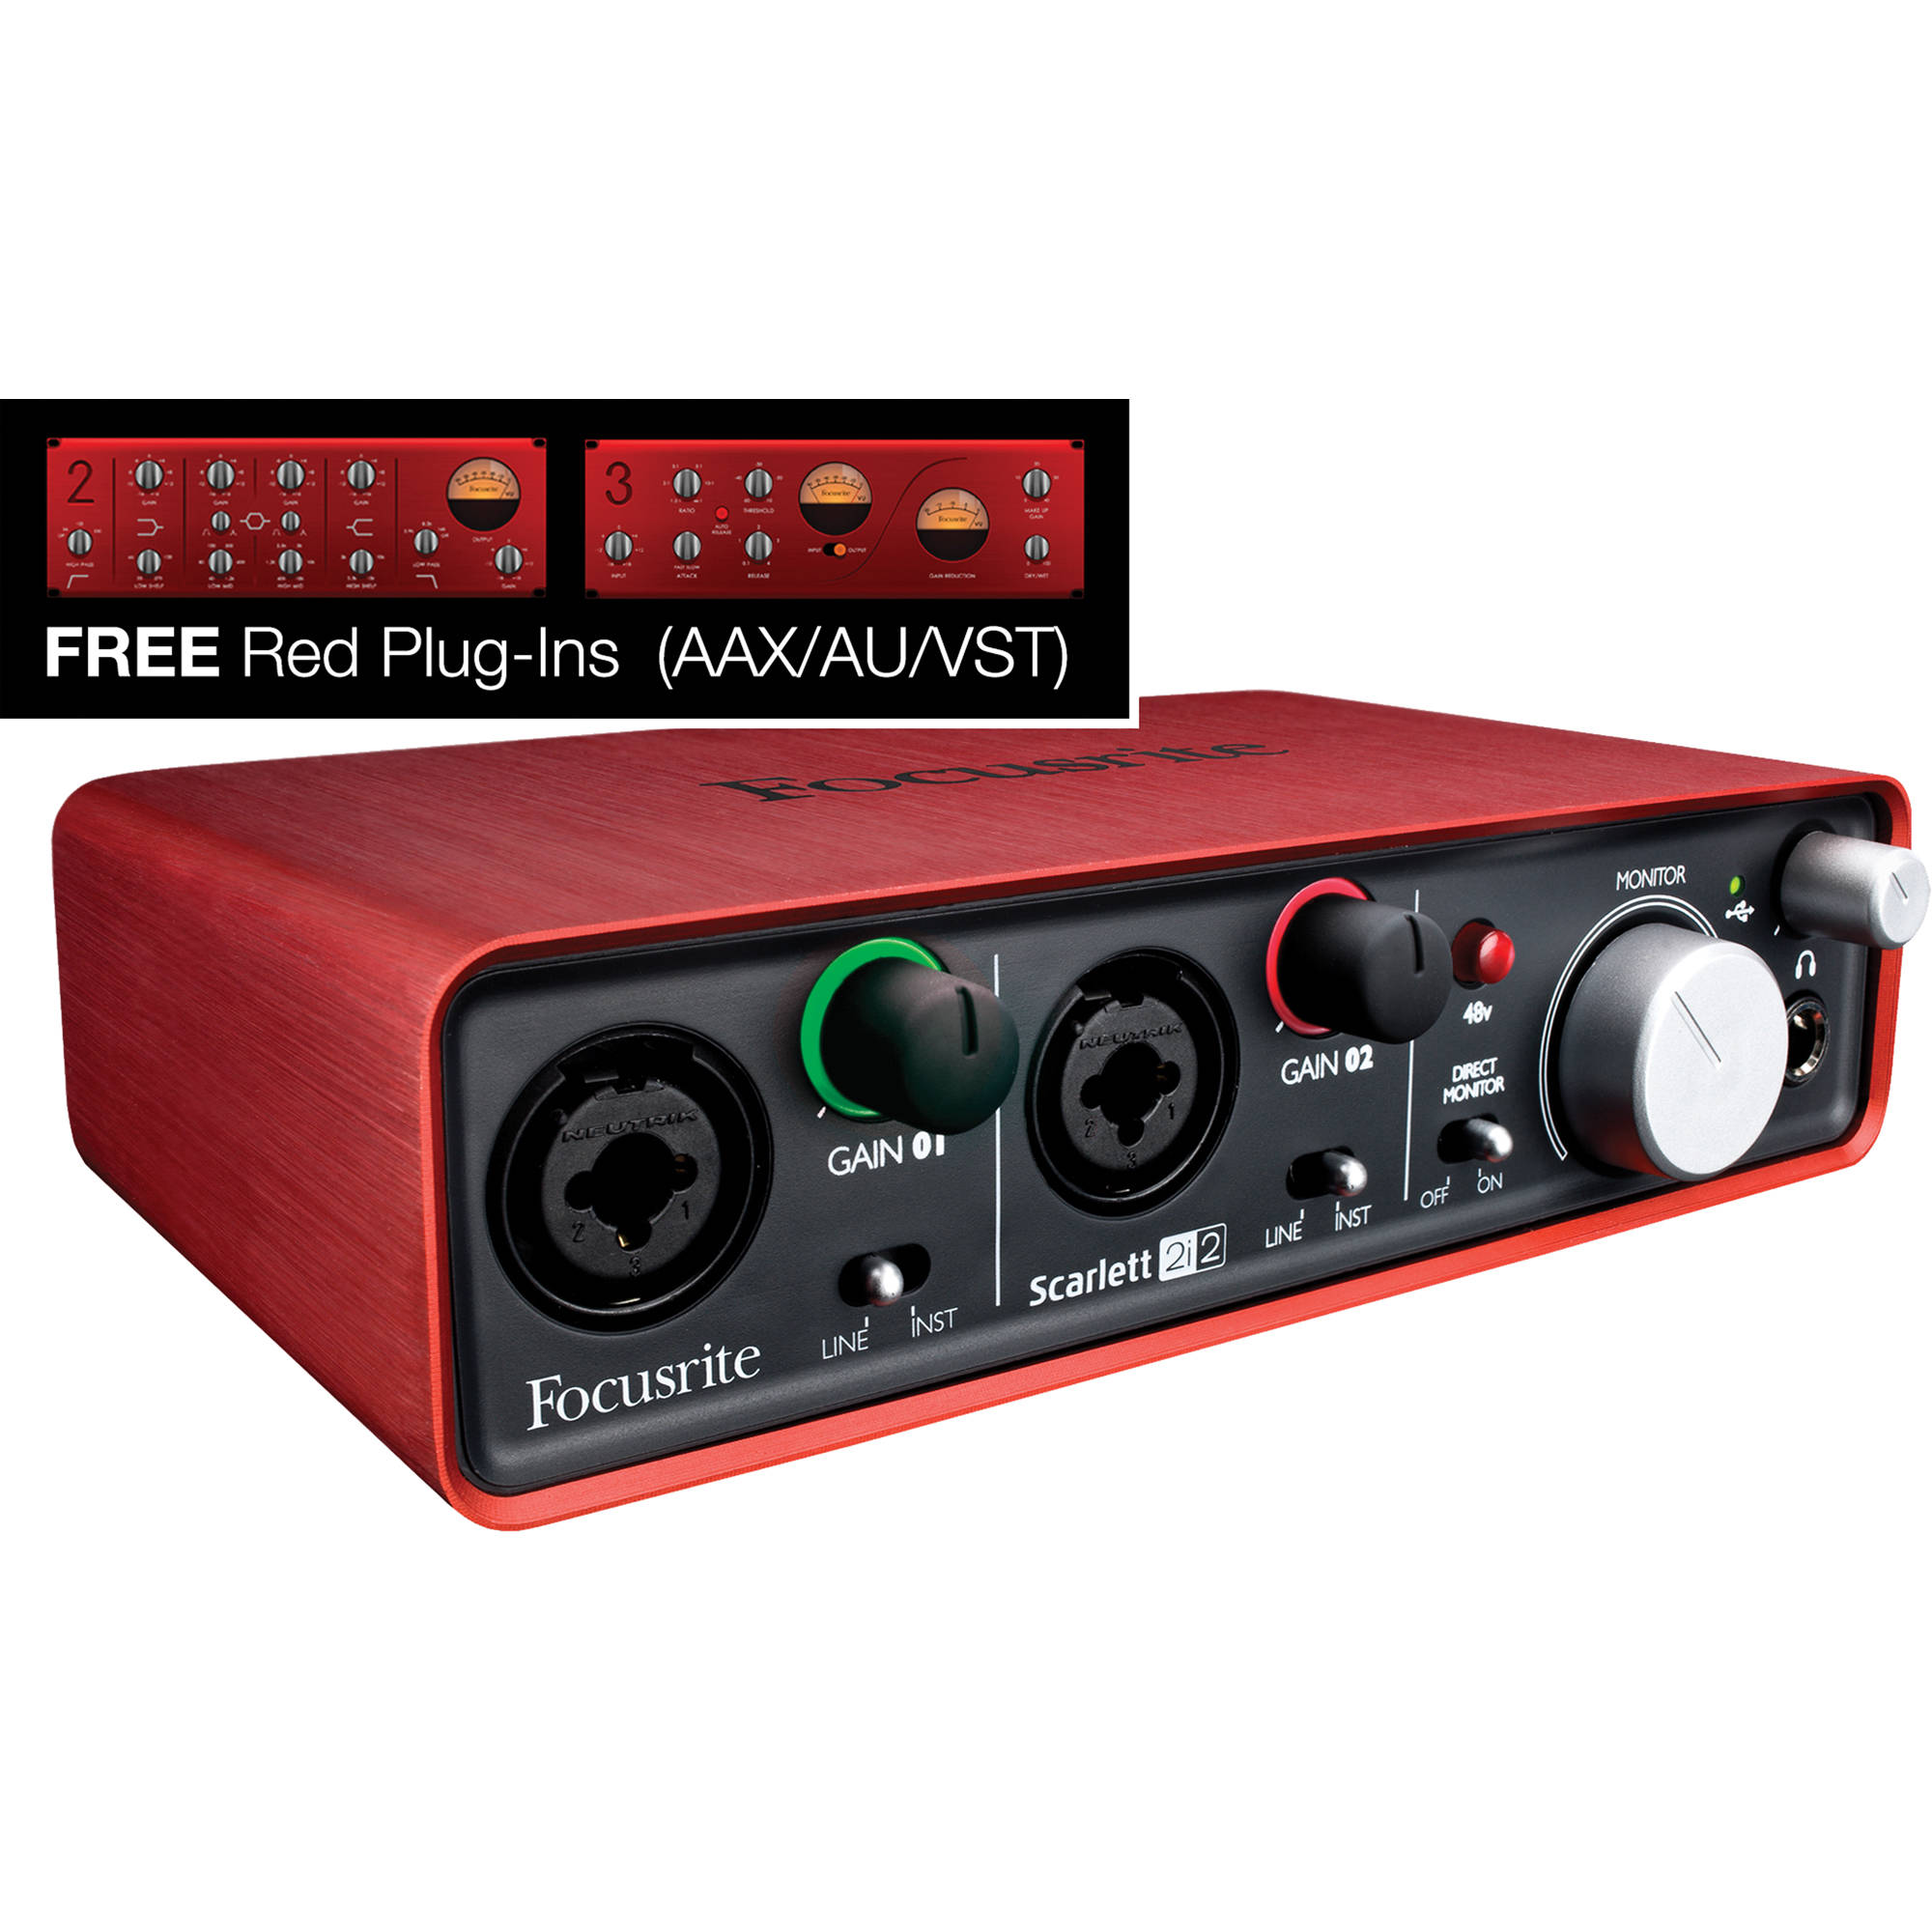 Focusrite Scarlett 2i2 - Portable USB Audio SCARLETT 2I2 ... Scarlett 2i2